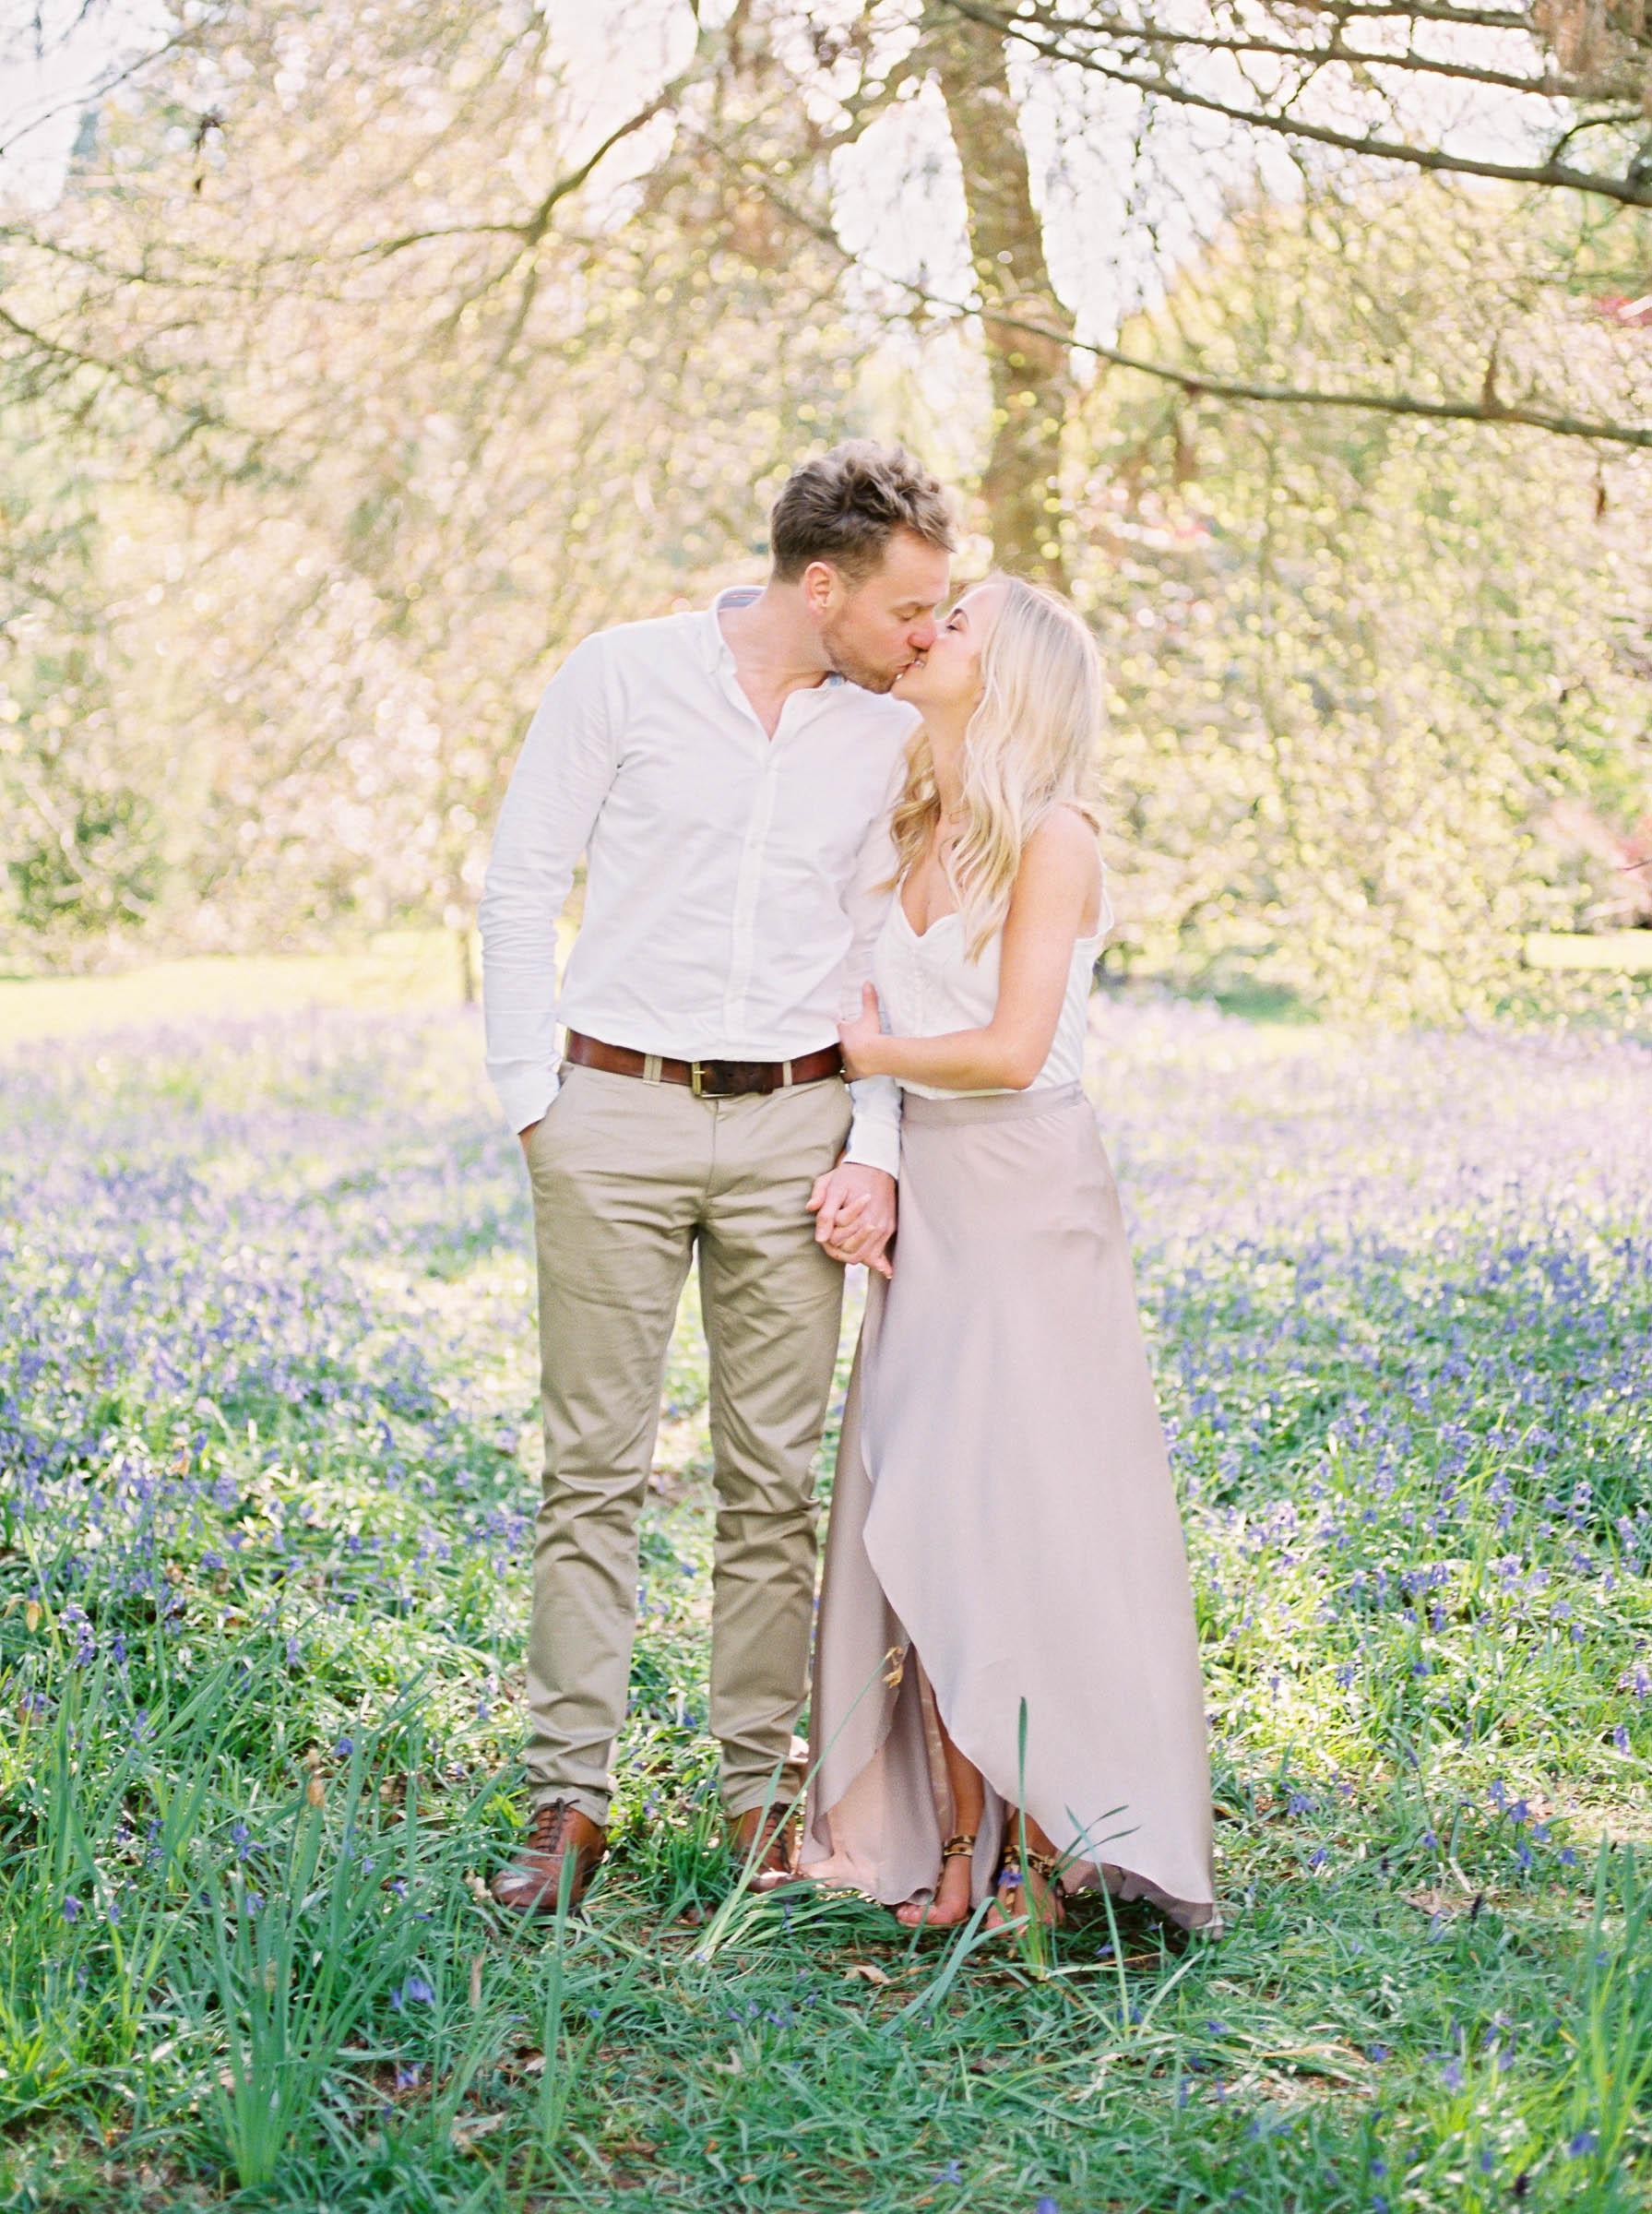 Amy O'Boyle Photography- Destination & UK Fine Art Film Wedding Photographer- Sheffield Park Garden National Trust Spring Engagement Shoot-11.jpg